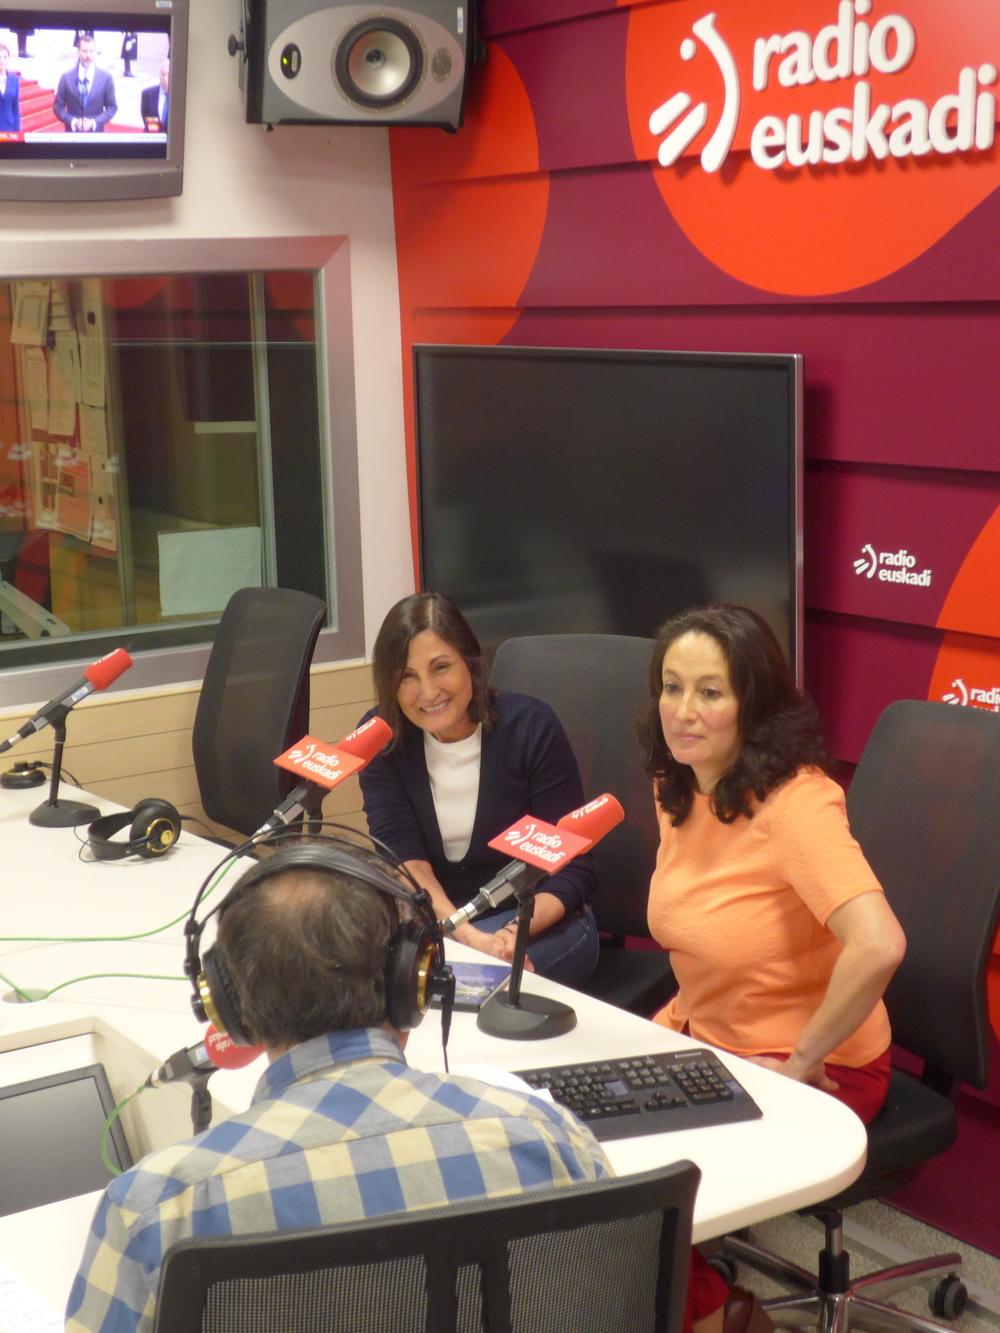 Jean-Marie Simon yAna Lucía Cuevas en Radio Euskadi.  Jean-Marie Simon and Ana Lucía Cuevas atRadio Euskadi.